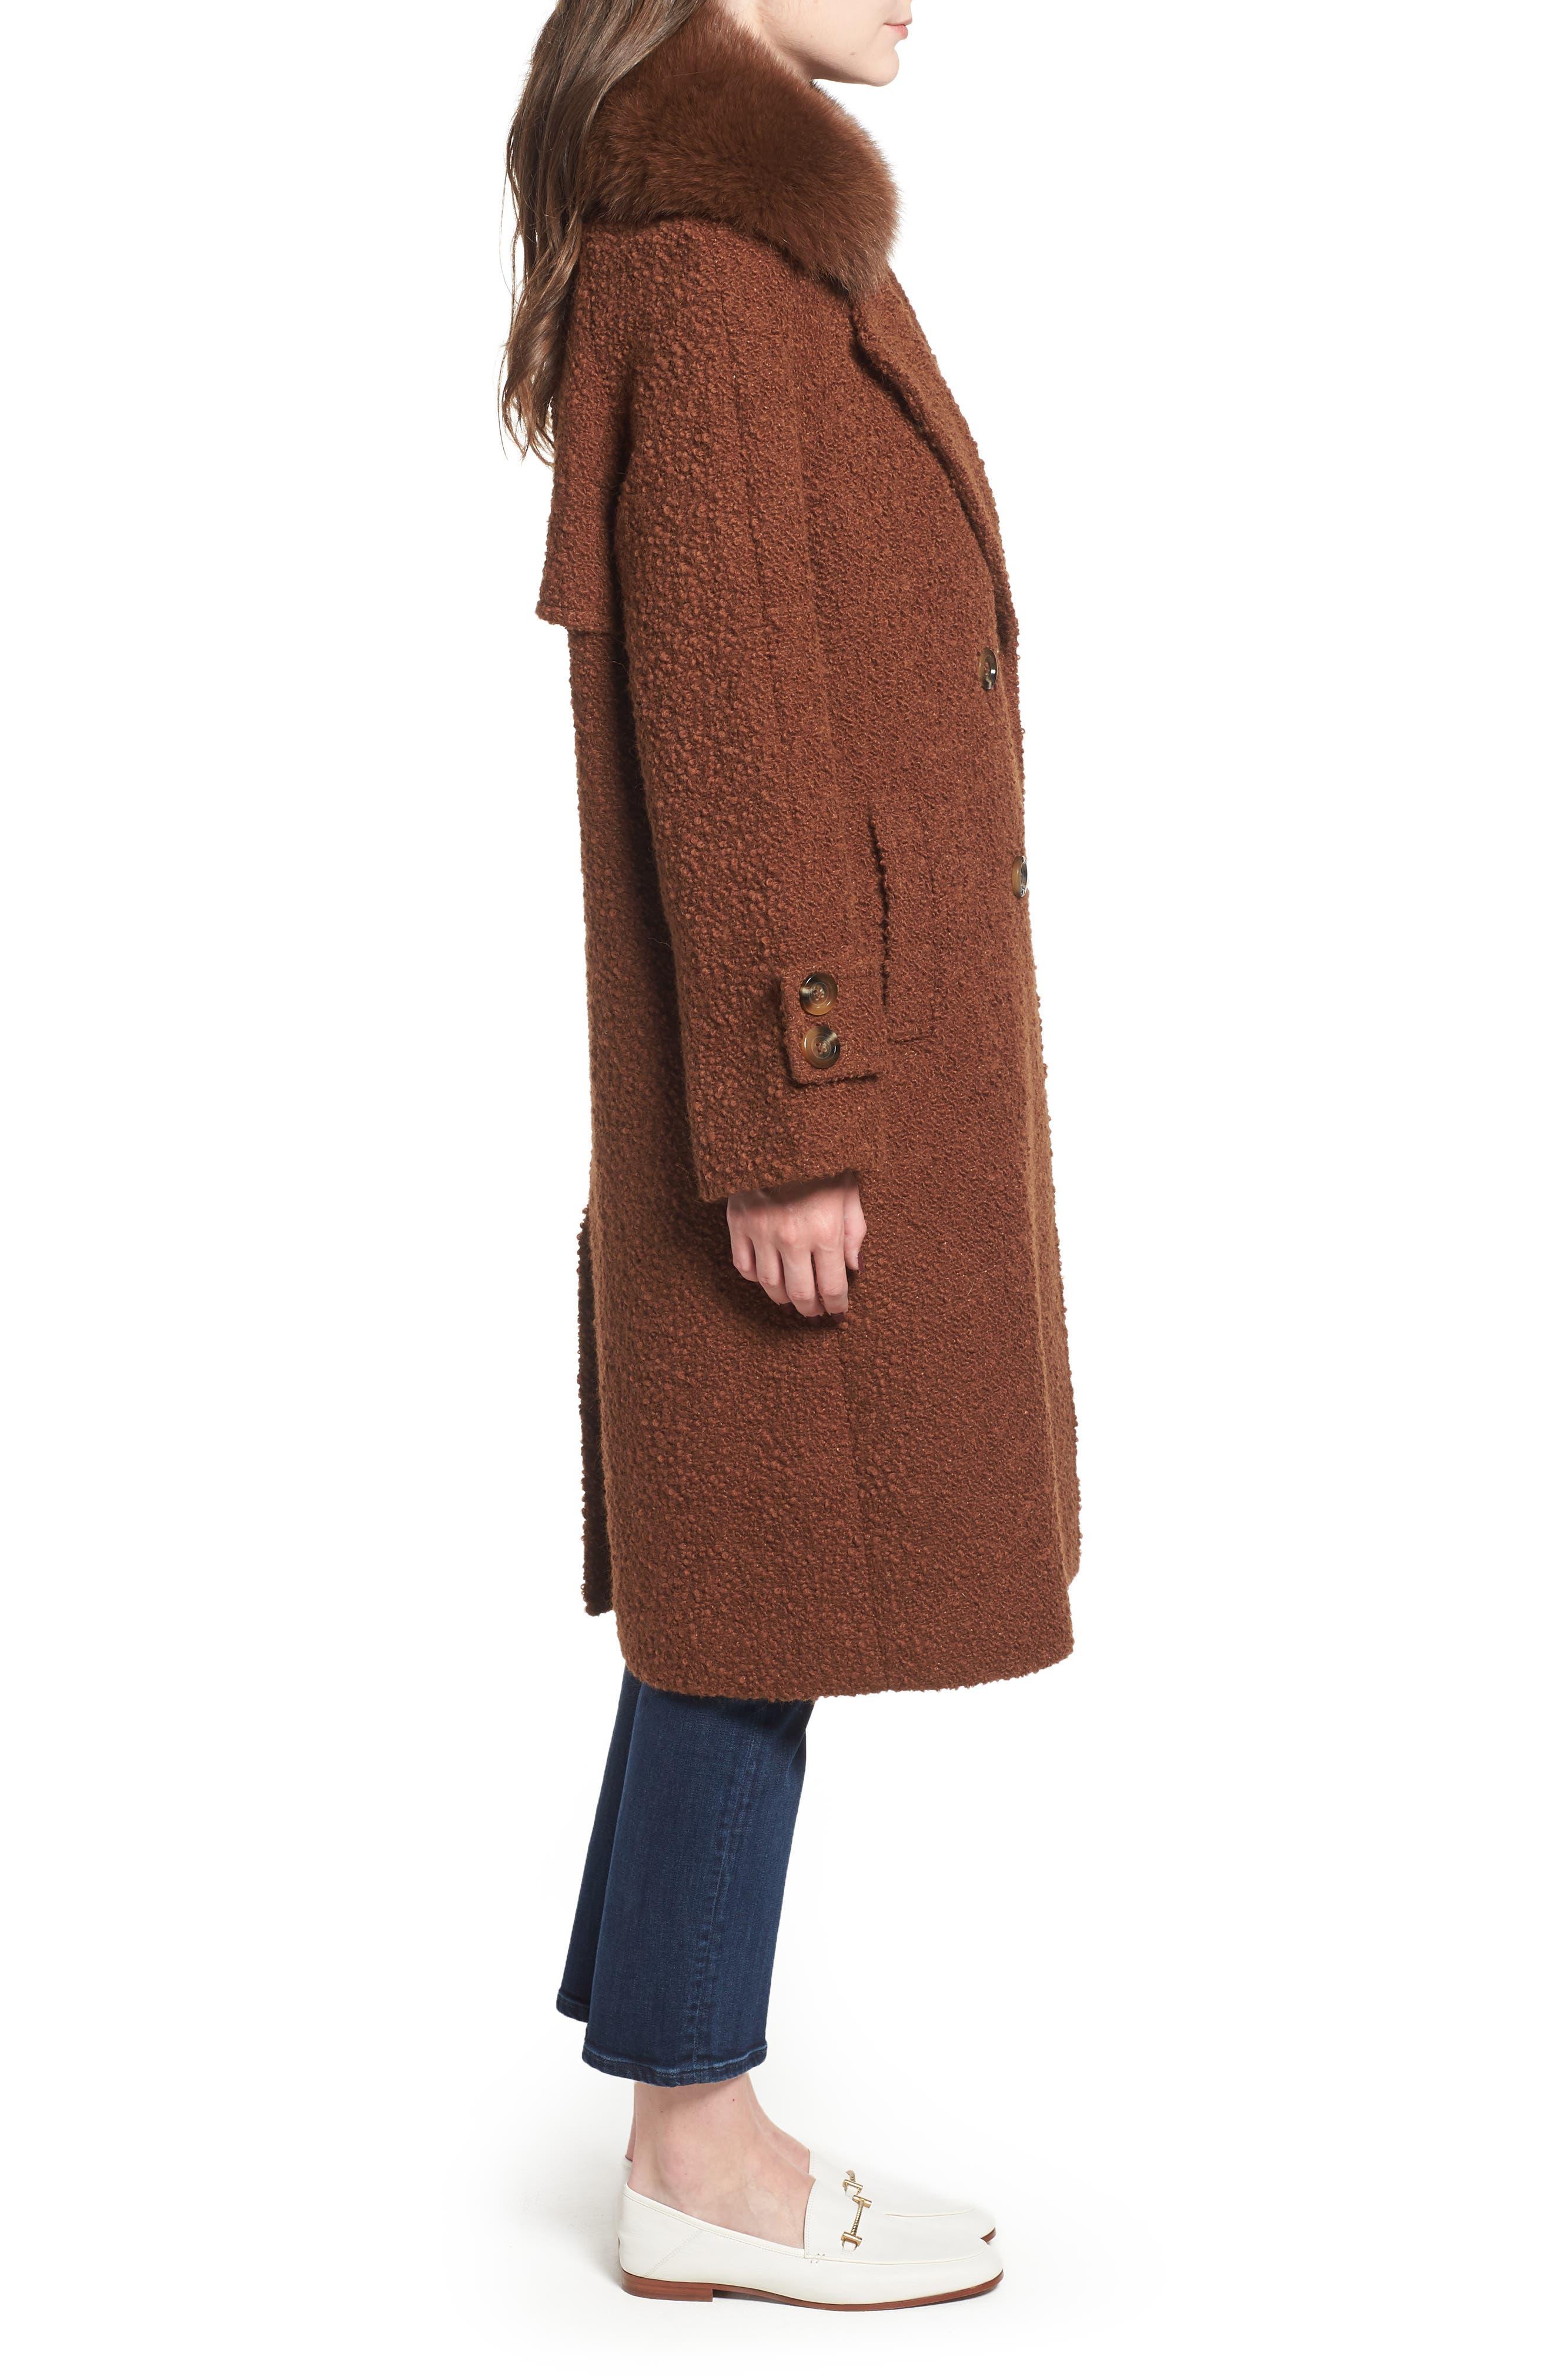 London Genuine Fox Fur Trim Long Coat,                             Alternate thumbnail 3, color,                             MOCHA